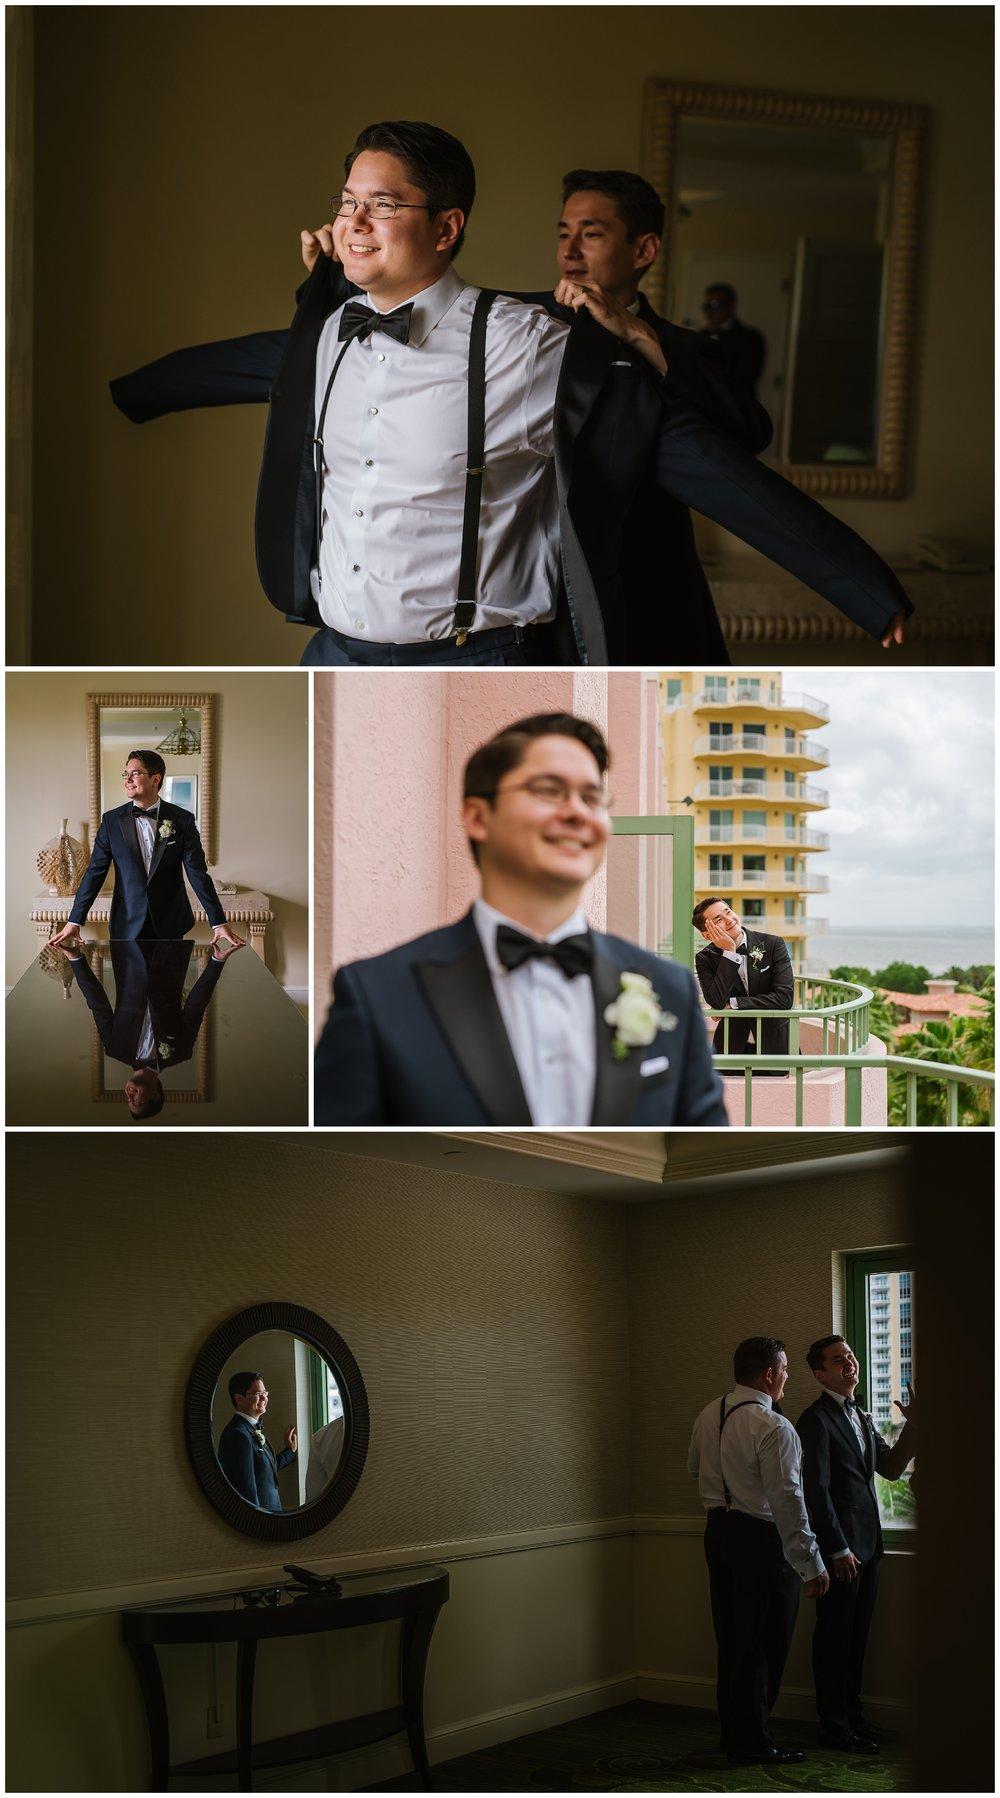 Ashlee-hamon-photography-year-in-review-2016-travel-wanderlust-vsco-adventure-wedding_0015.jpg